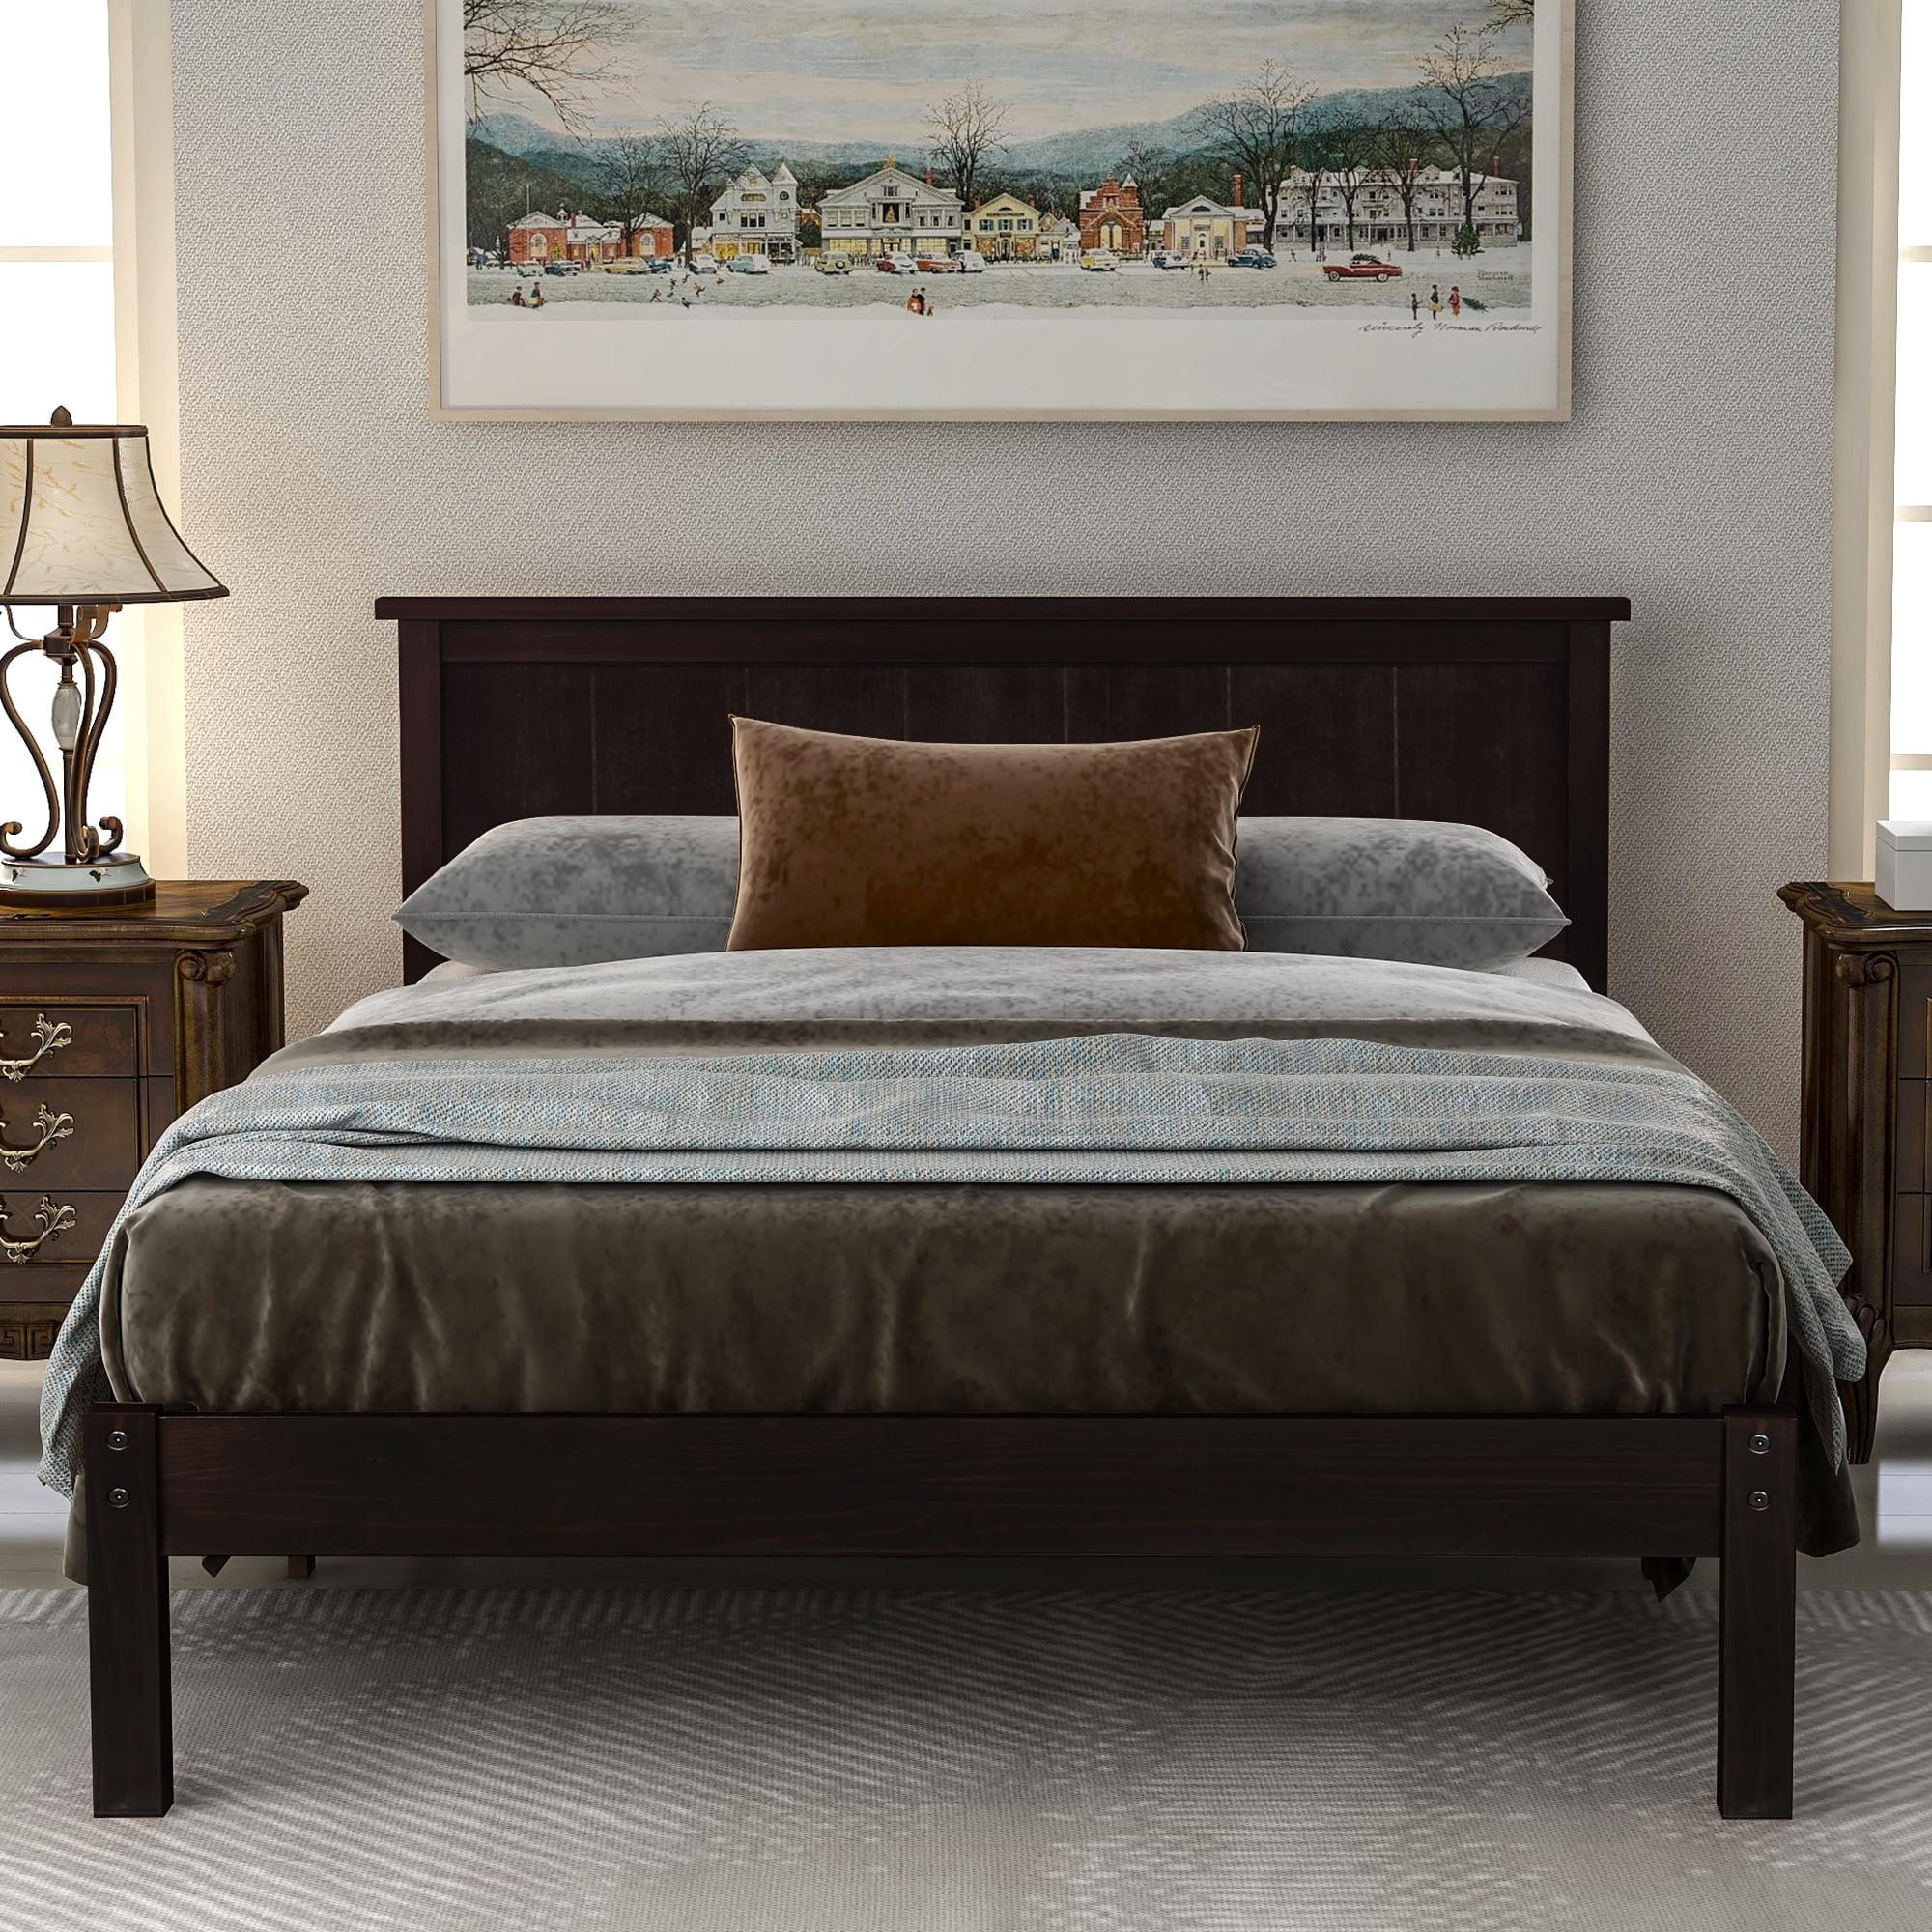 Queen Bed Frame, Brown Wood Platform Bed Frame with ...